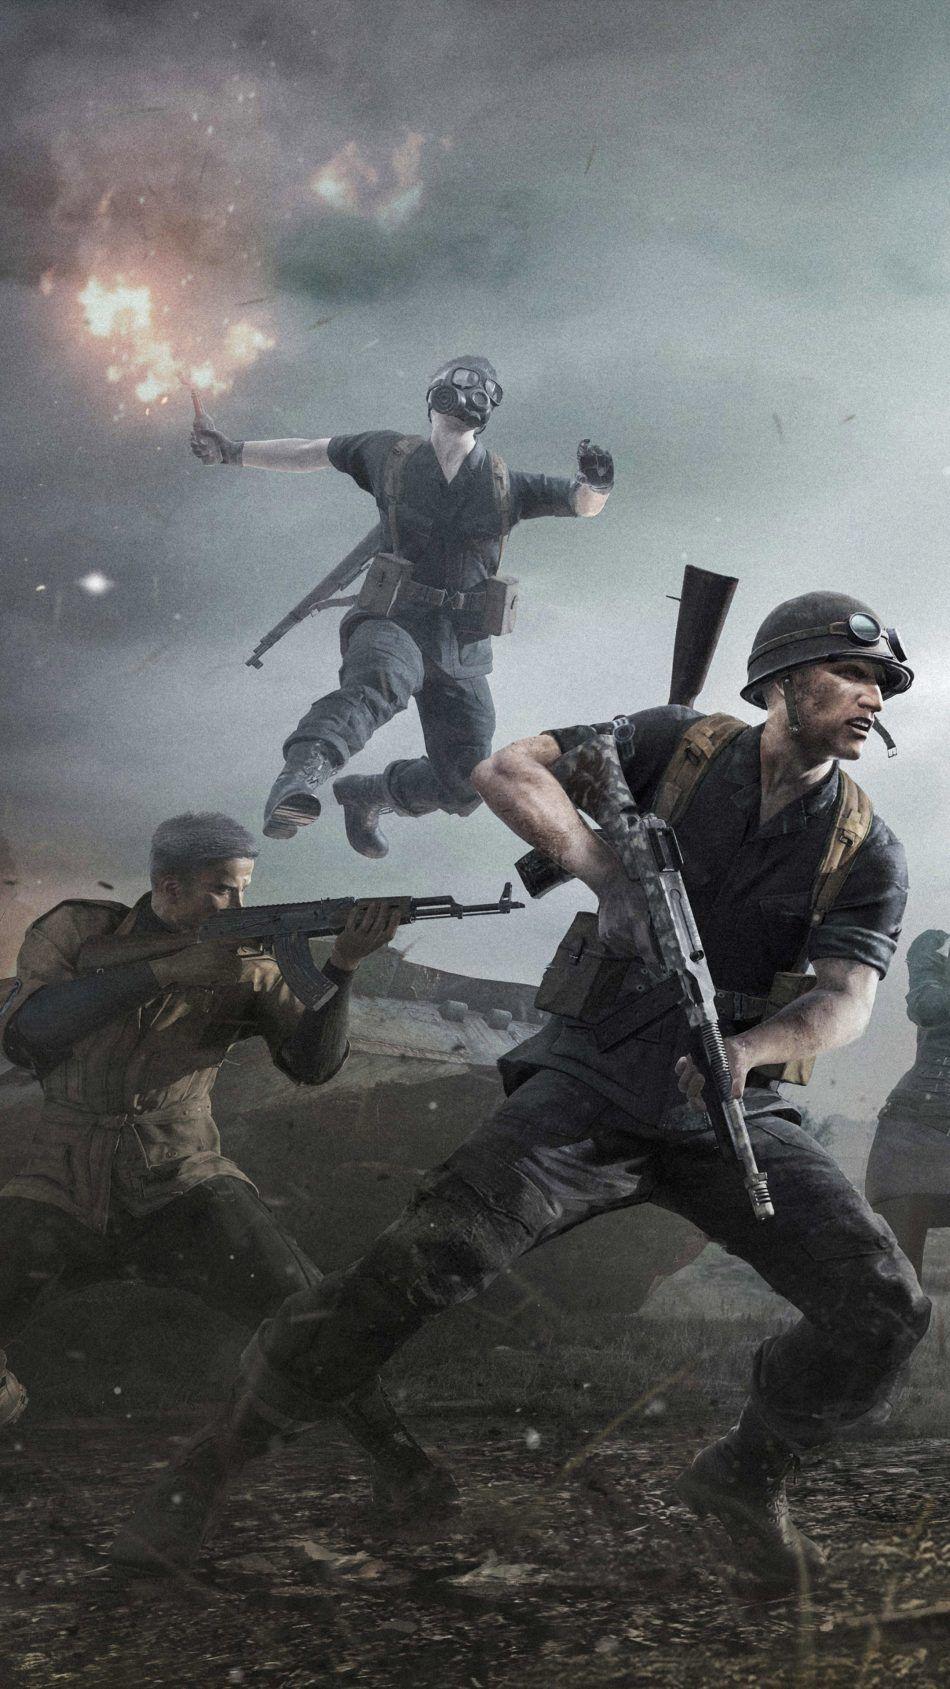 Pin on PlayerUnknown's Battlegrounds (PUBG) Wallpapers